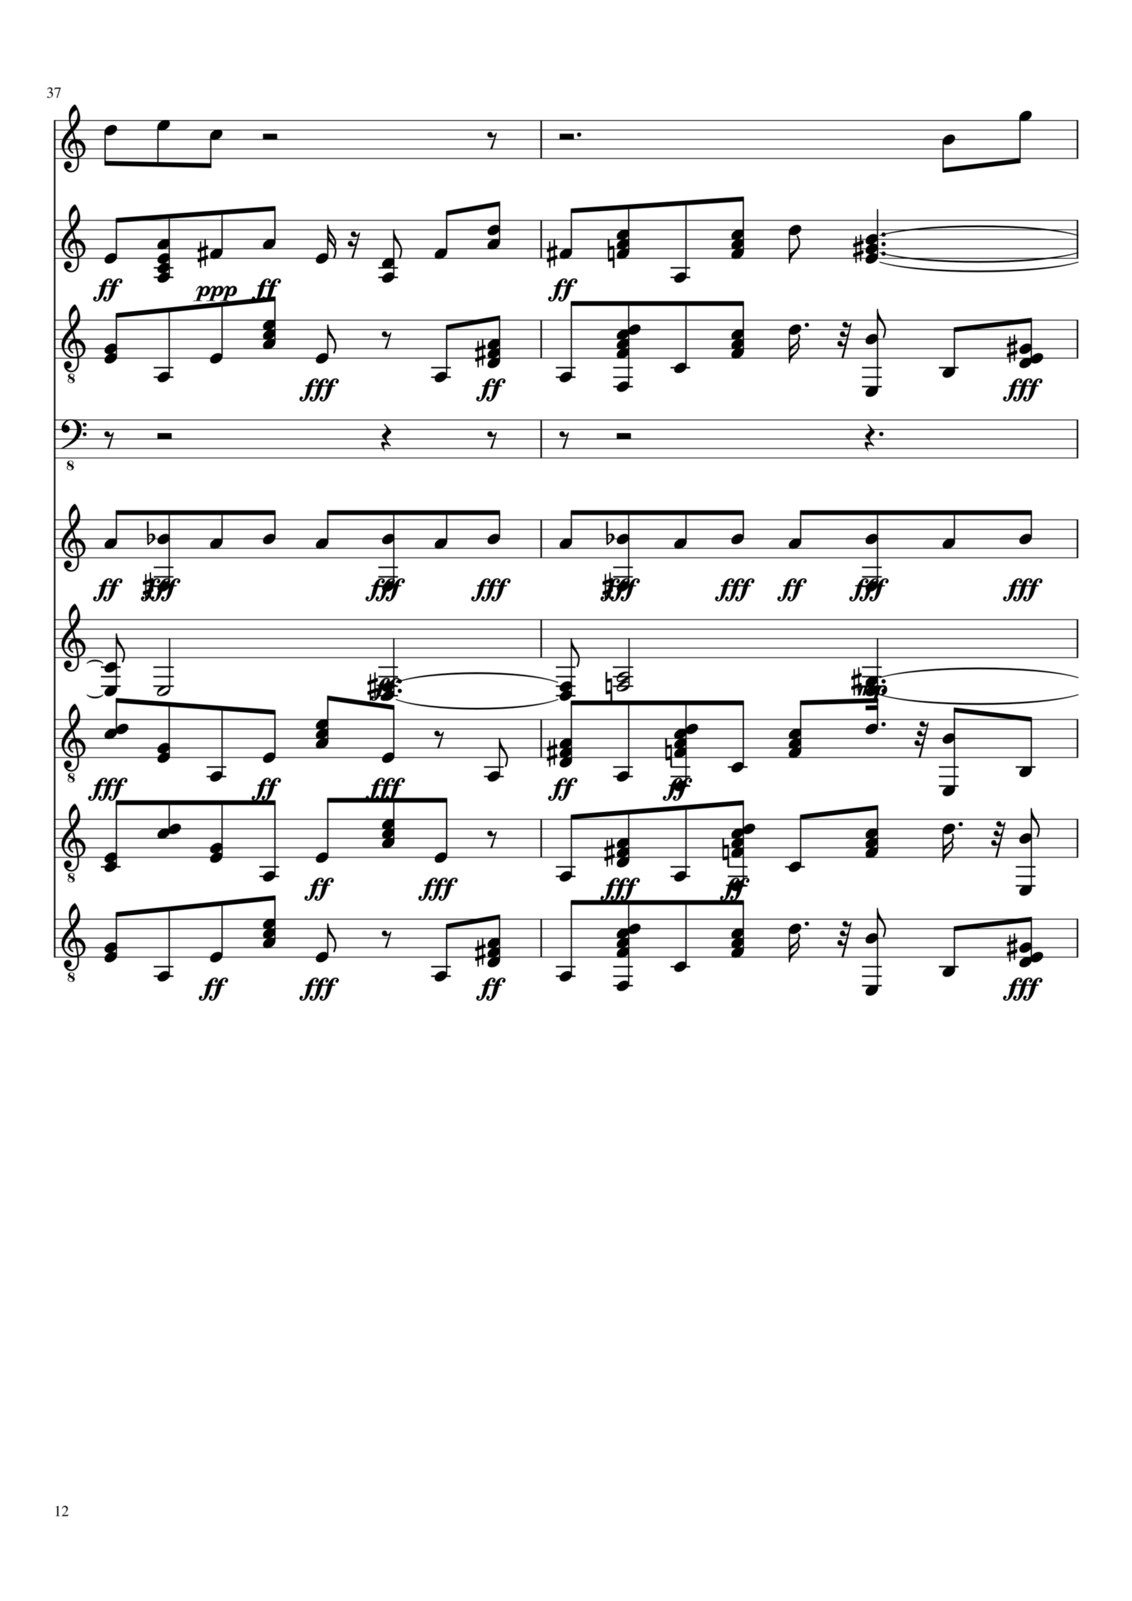 18 berez slide, Image 12